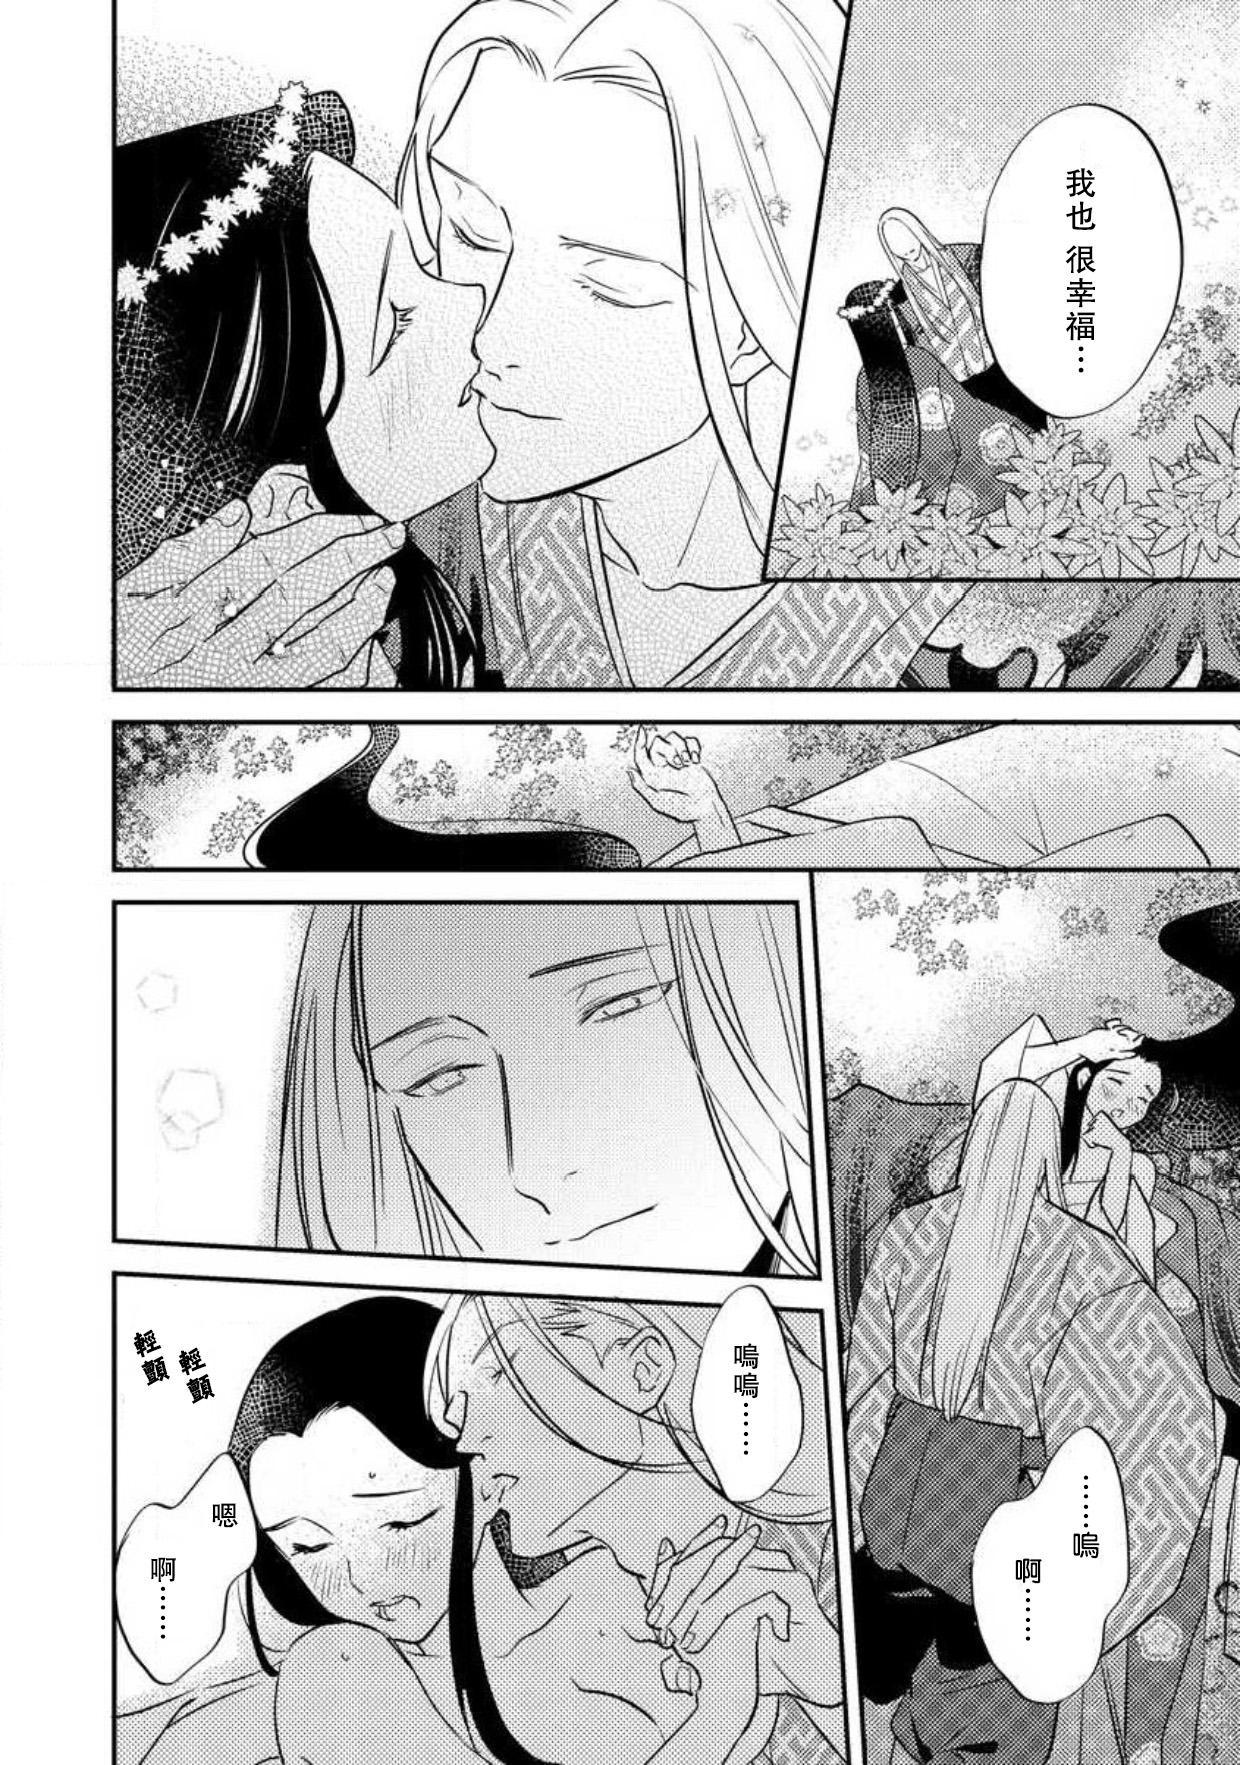 Oeyama suimutan utsukushiki oni no toraware hime | 大江山醉夢逸話 美麗的鬼與被囚禁的公主 Ch. 1-8 195